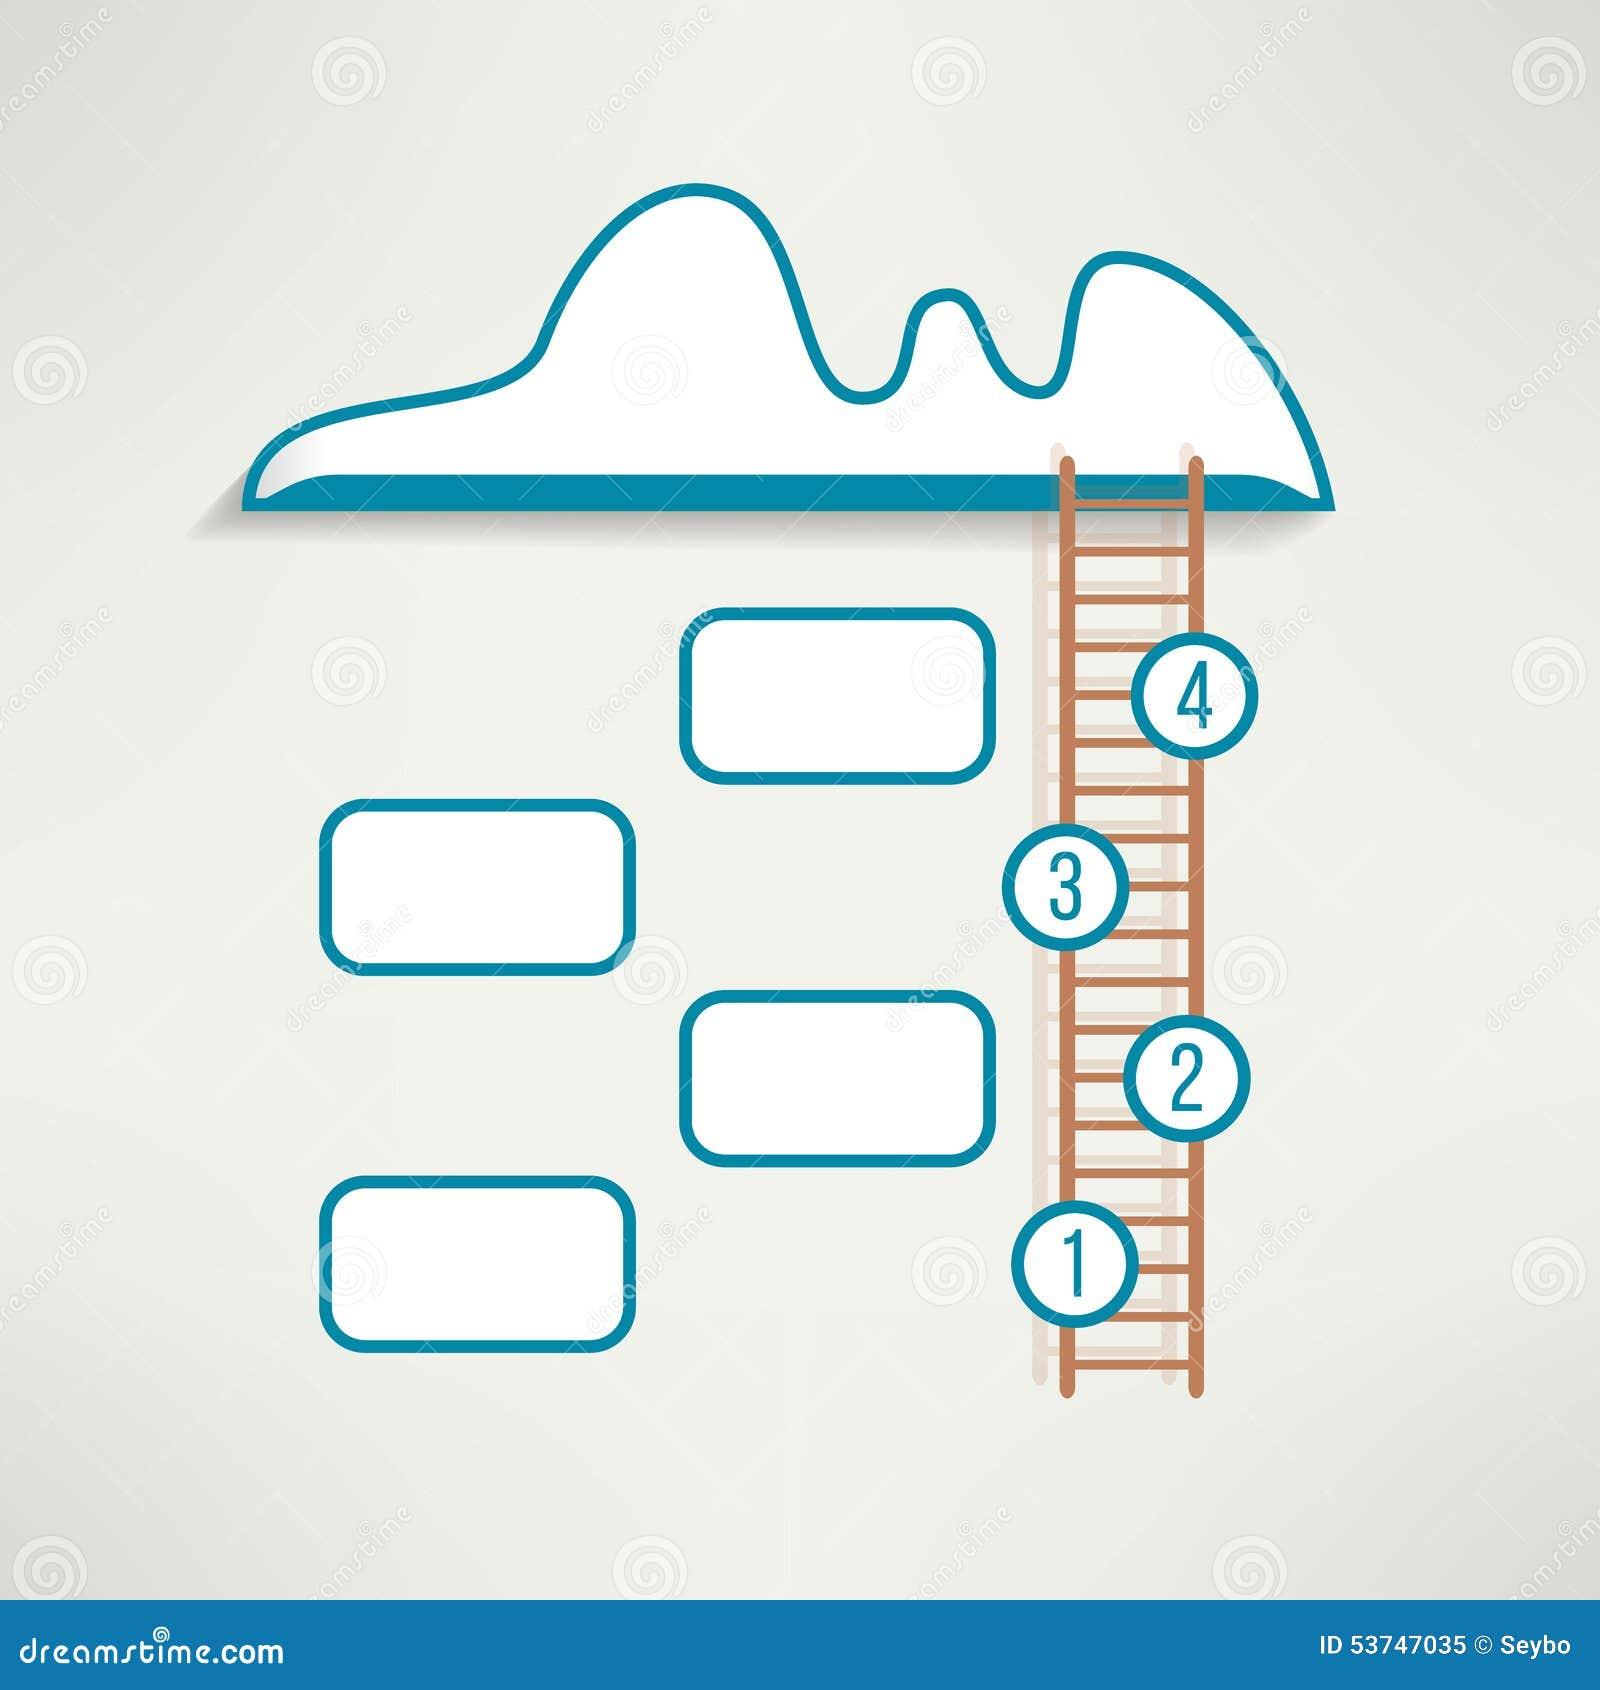 cloud ladder simple clean infographics design stock vector cloud ladder simple clean infographics design